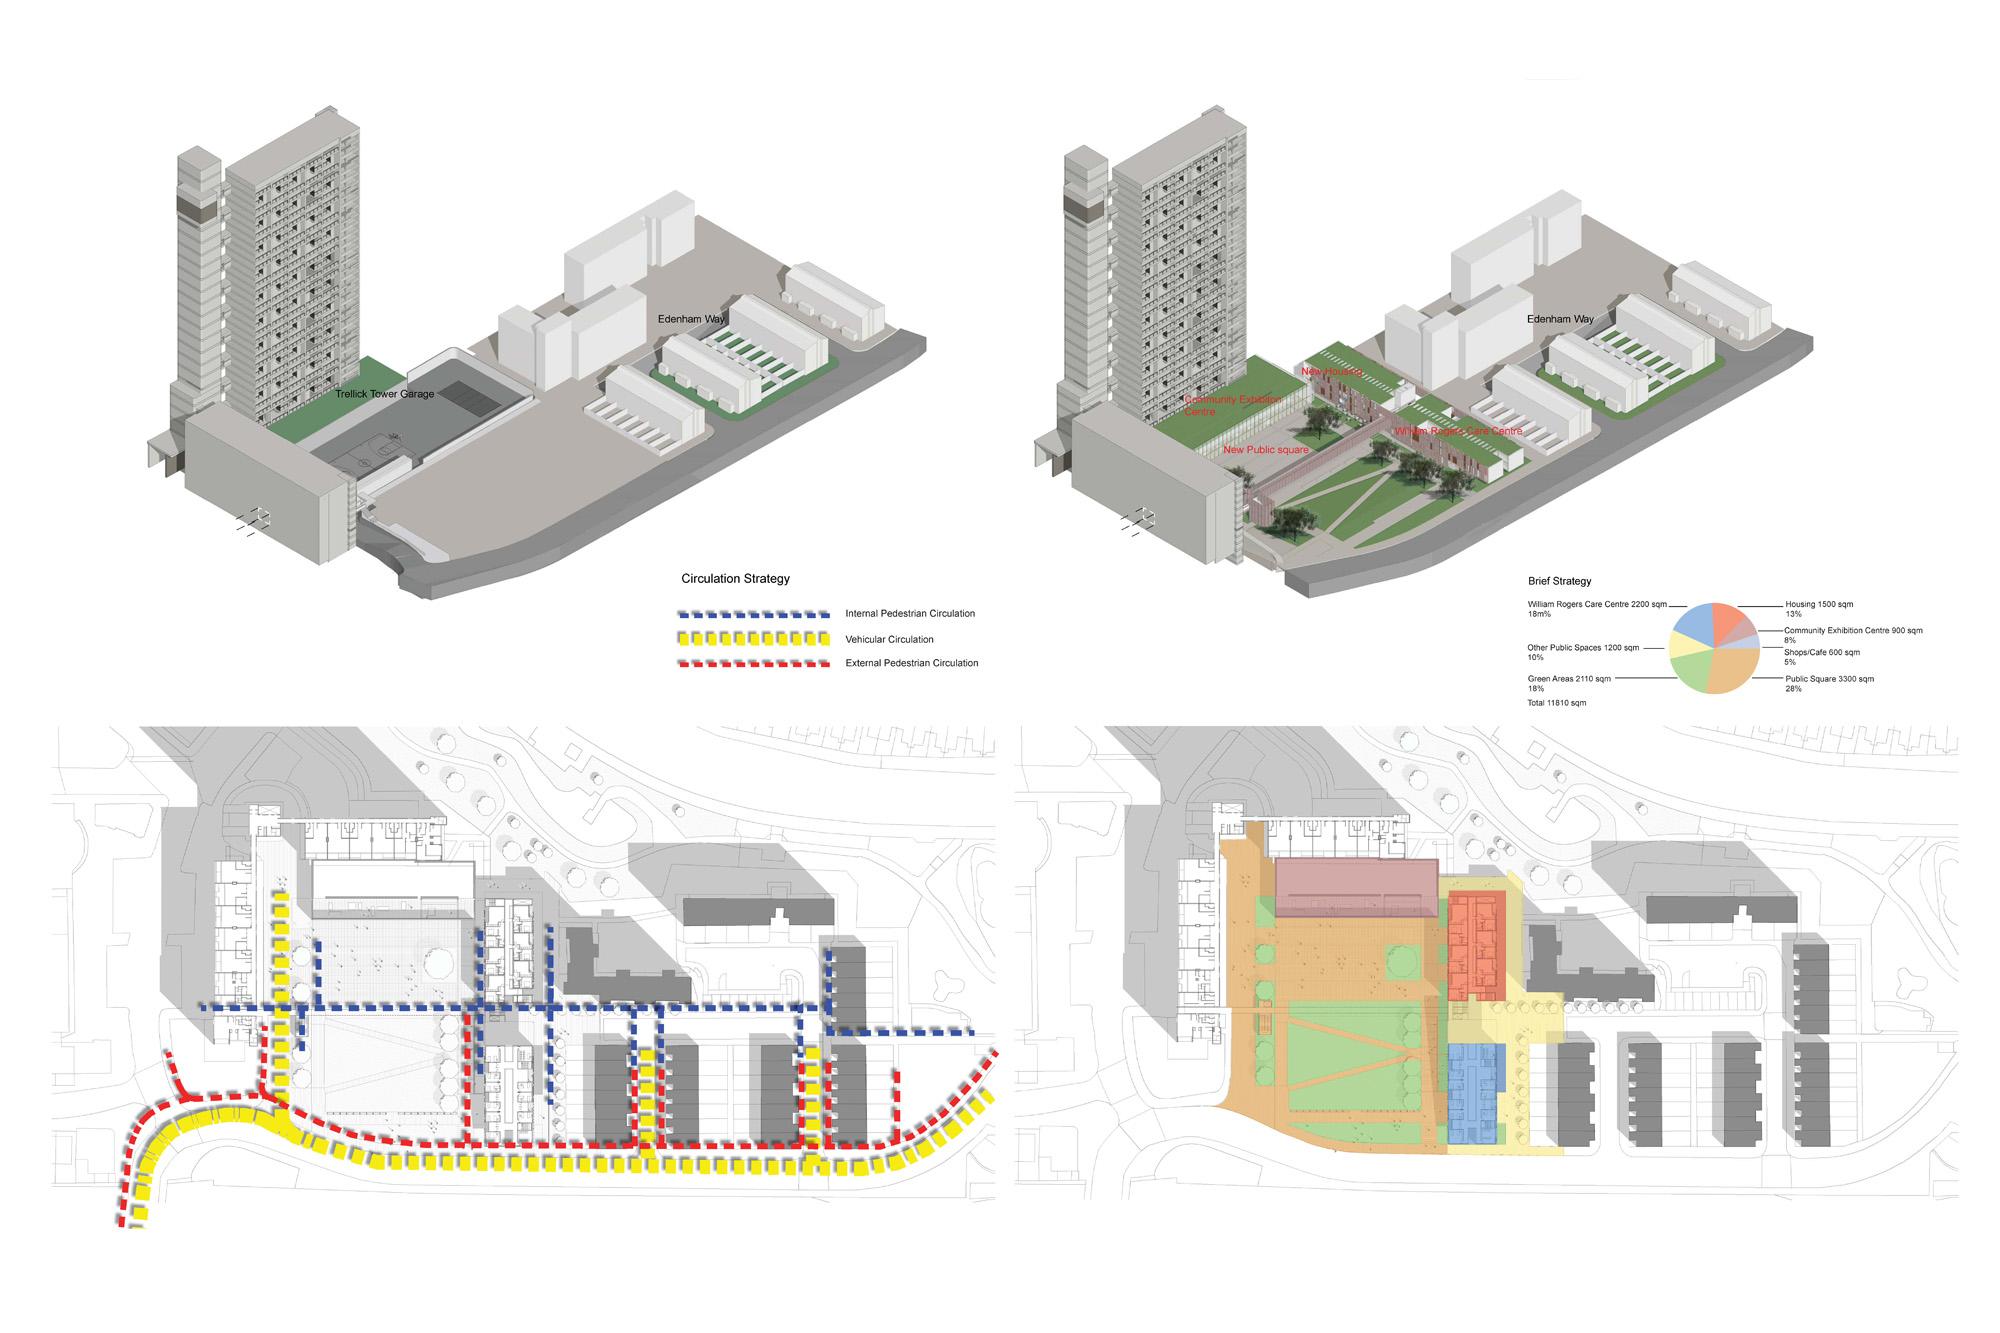 Tower Of London Floor Plan Trellick Tower Masterplan Dpaw